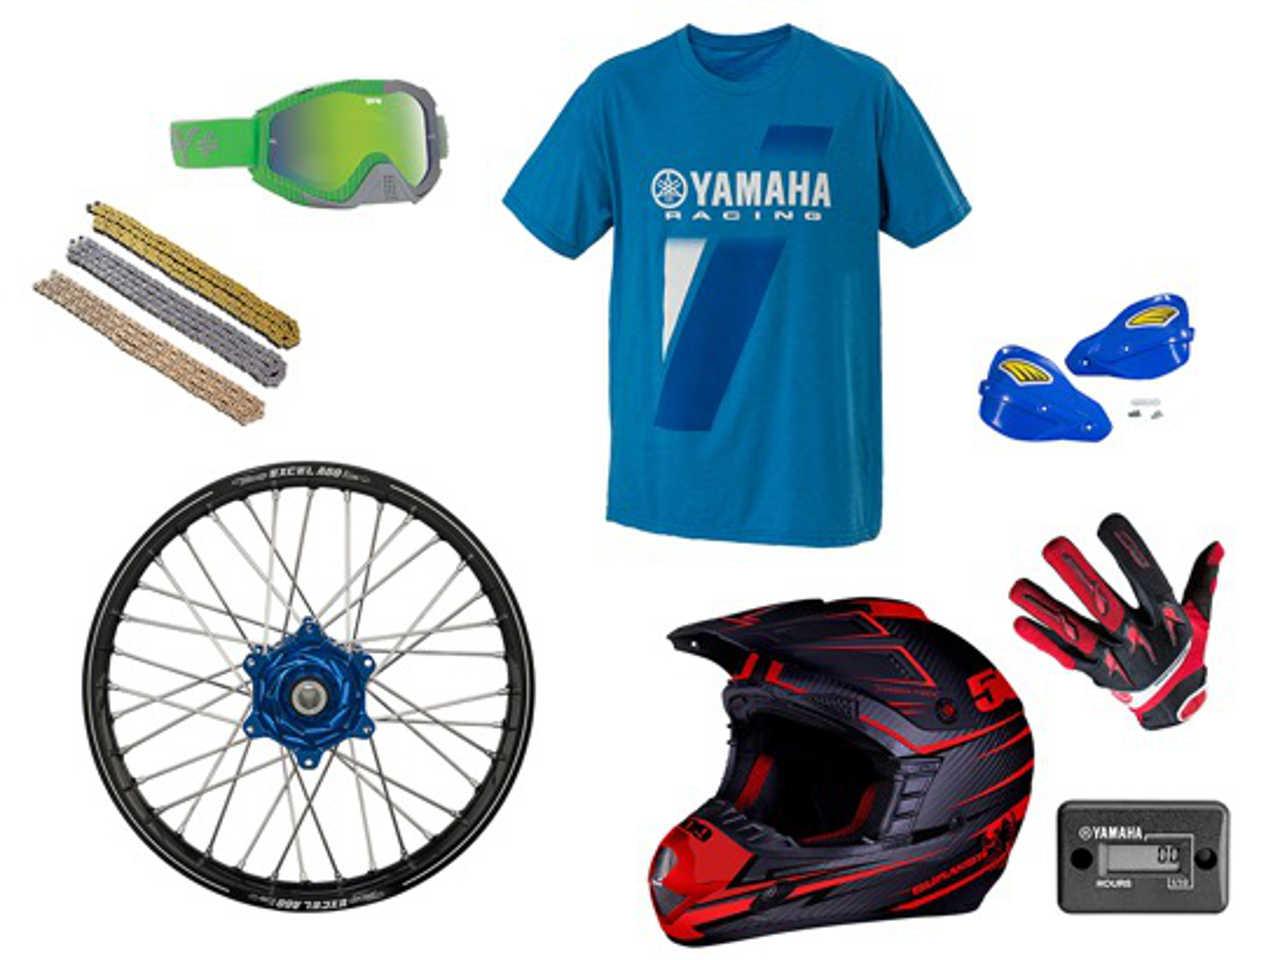 2014 Yamaha Motor Corporation Parts And Accessory Group U